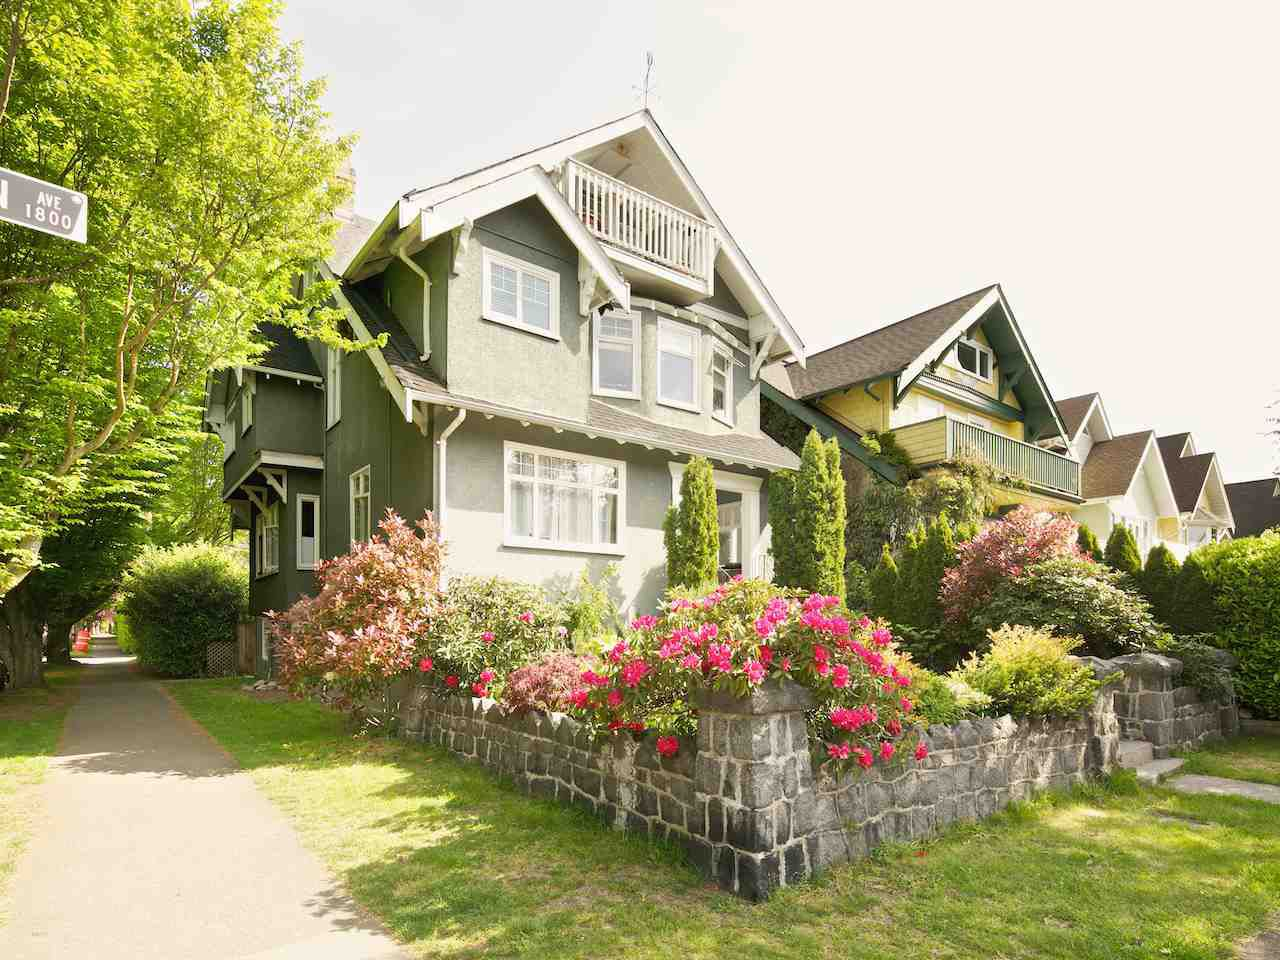 Main Photo: 1855 CREELMAN AVENUE in Vancouver: Kitsilano House for sale (Vancouver West)  : MLS®# R2064016